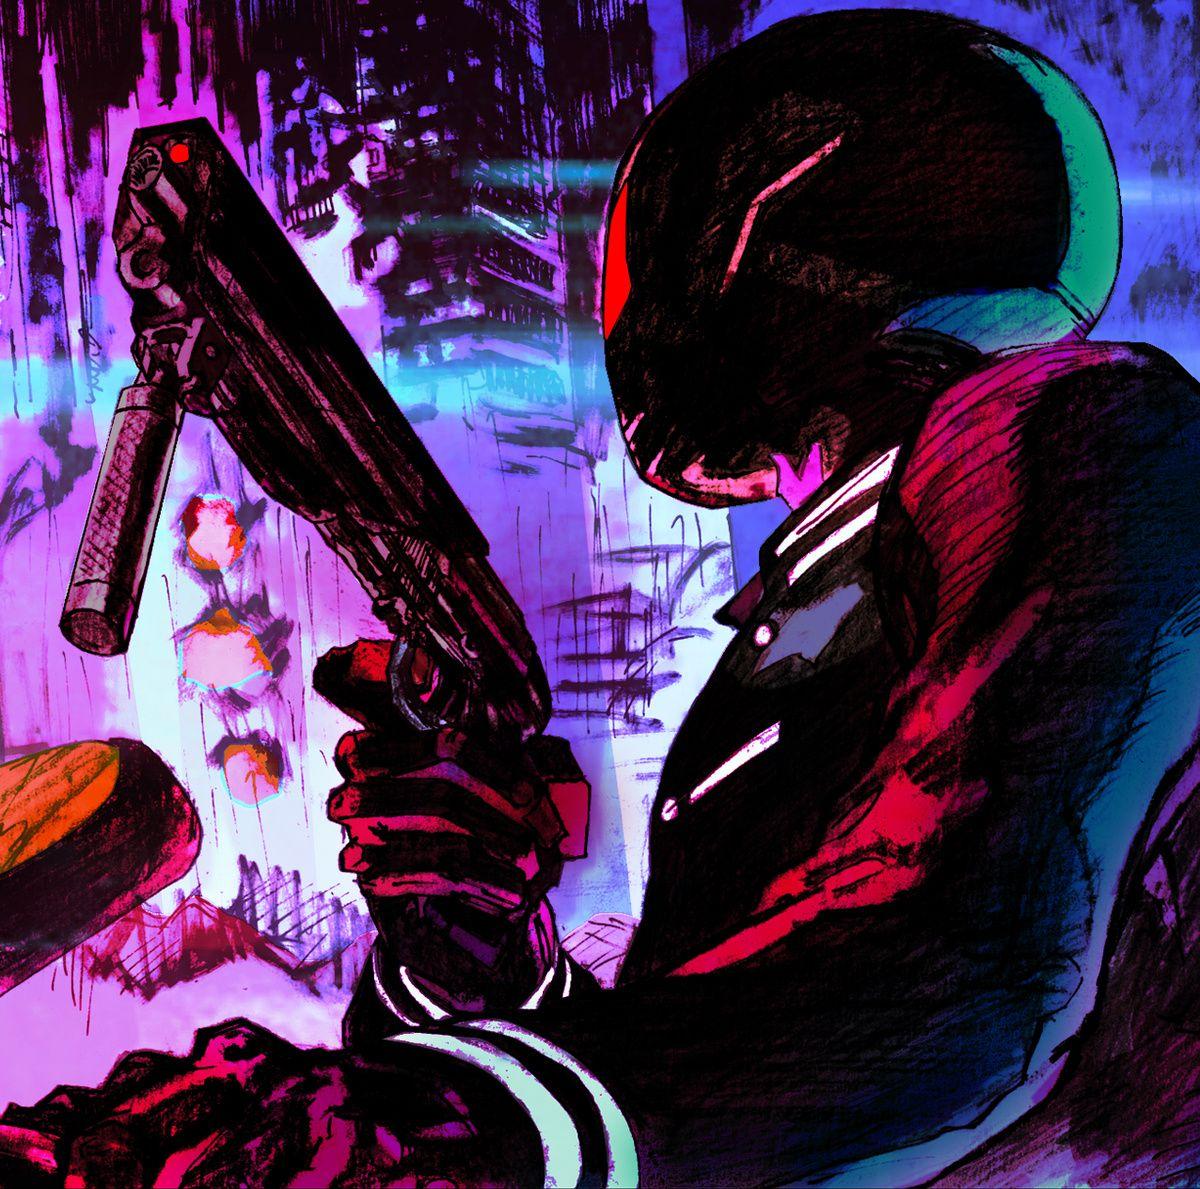 Japanese Sci Fi Art Iso50 Blog: Retro Waves